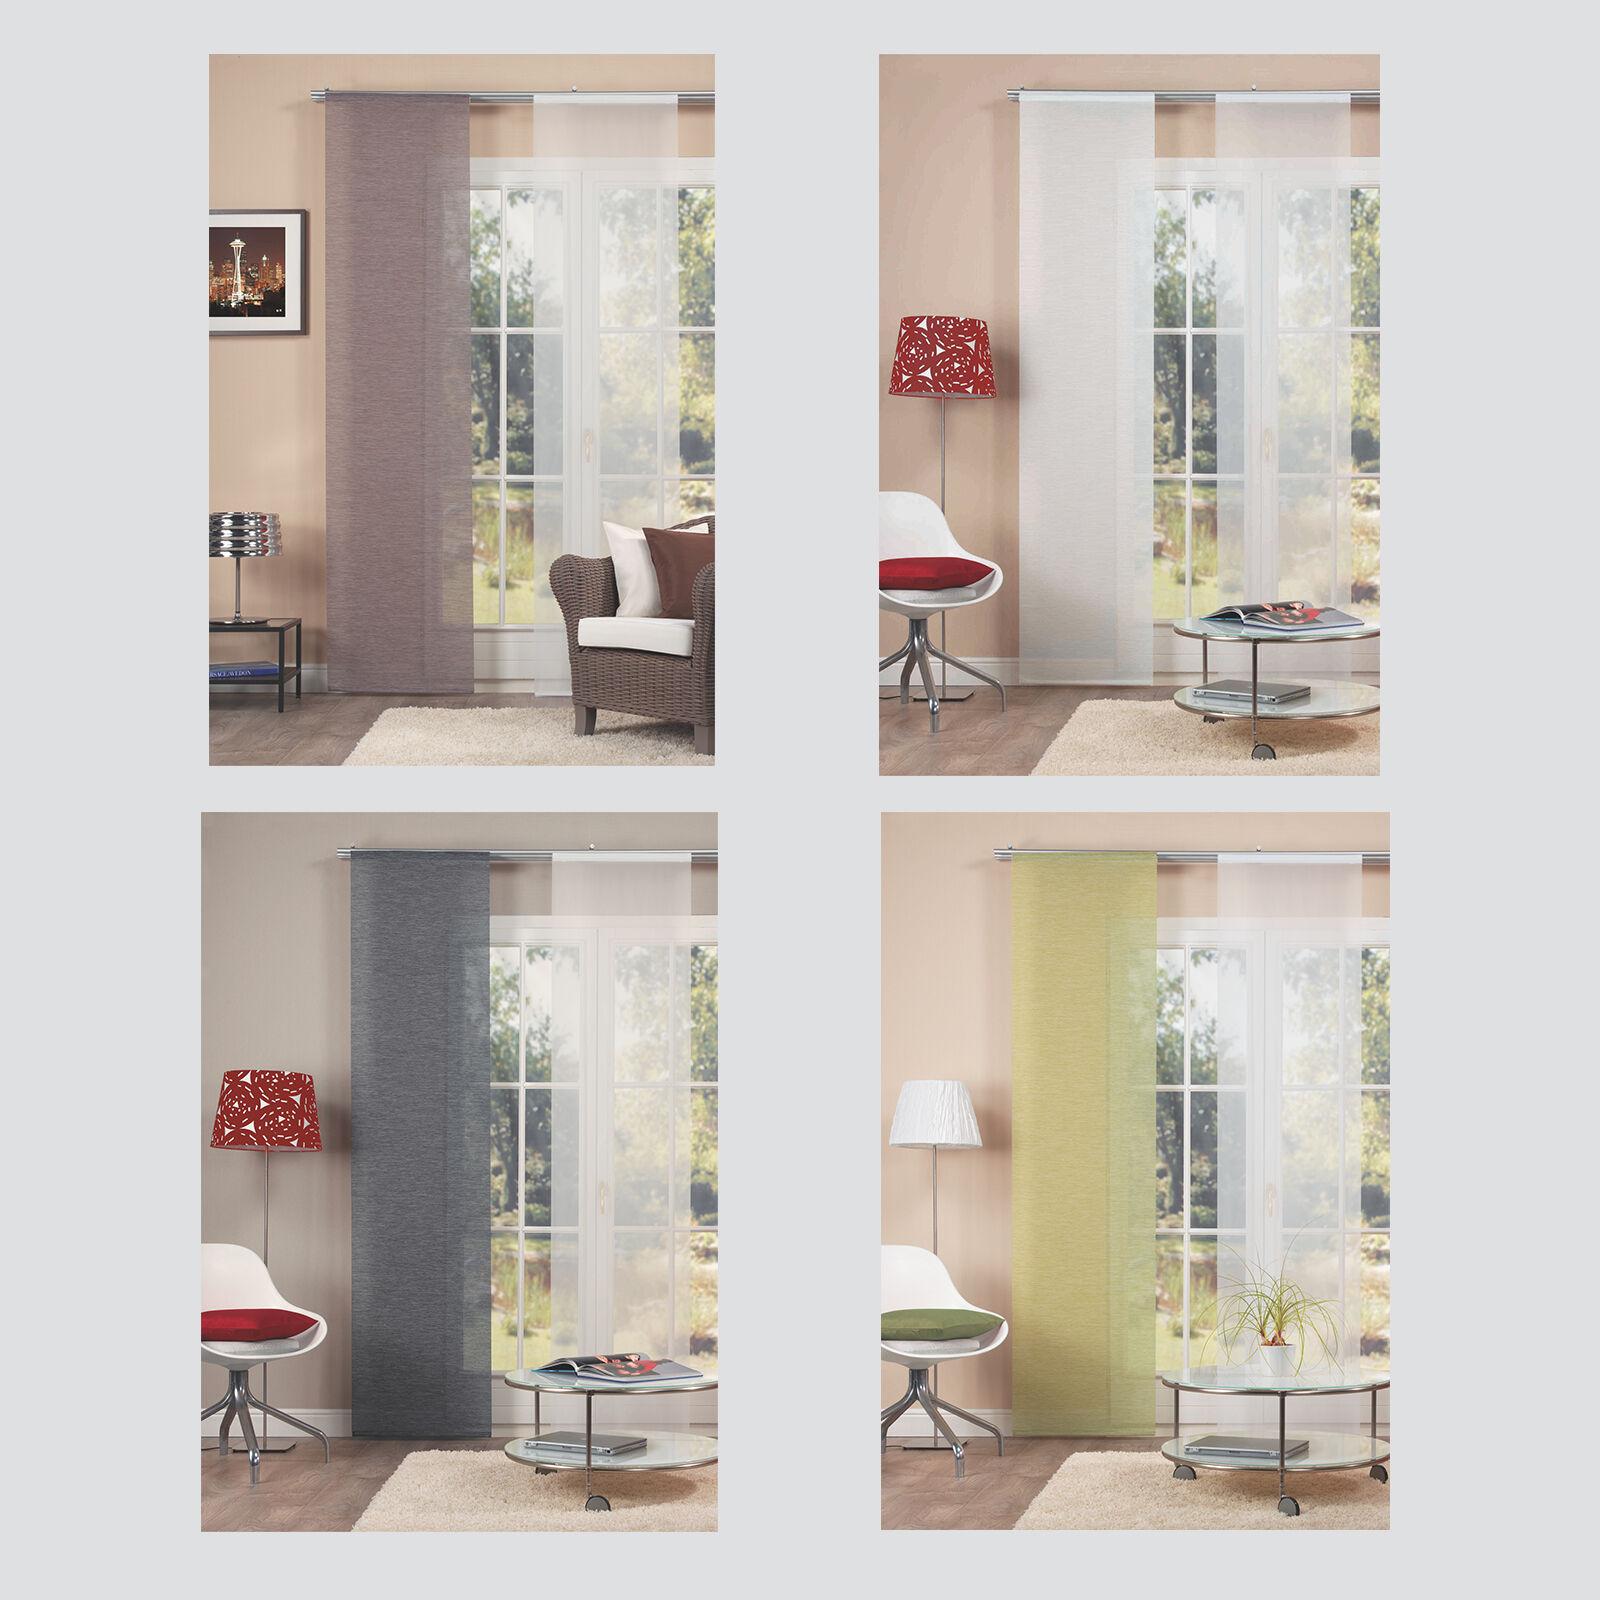 bambusoptik uni struktur schiebevorhang schiebegardine. Black Bedroom Furniture Sets. Home Design Ideas